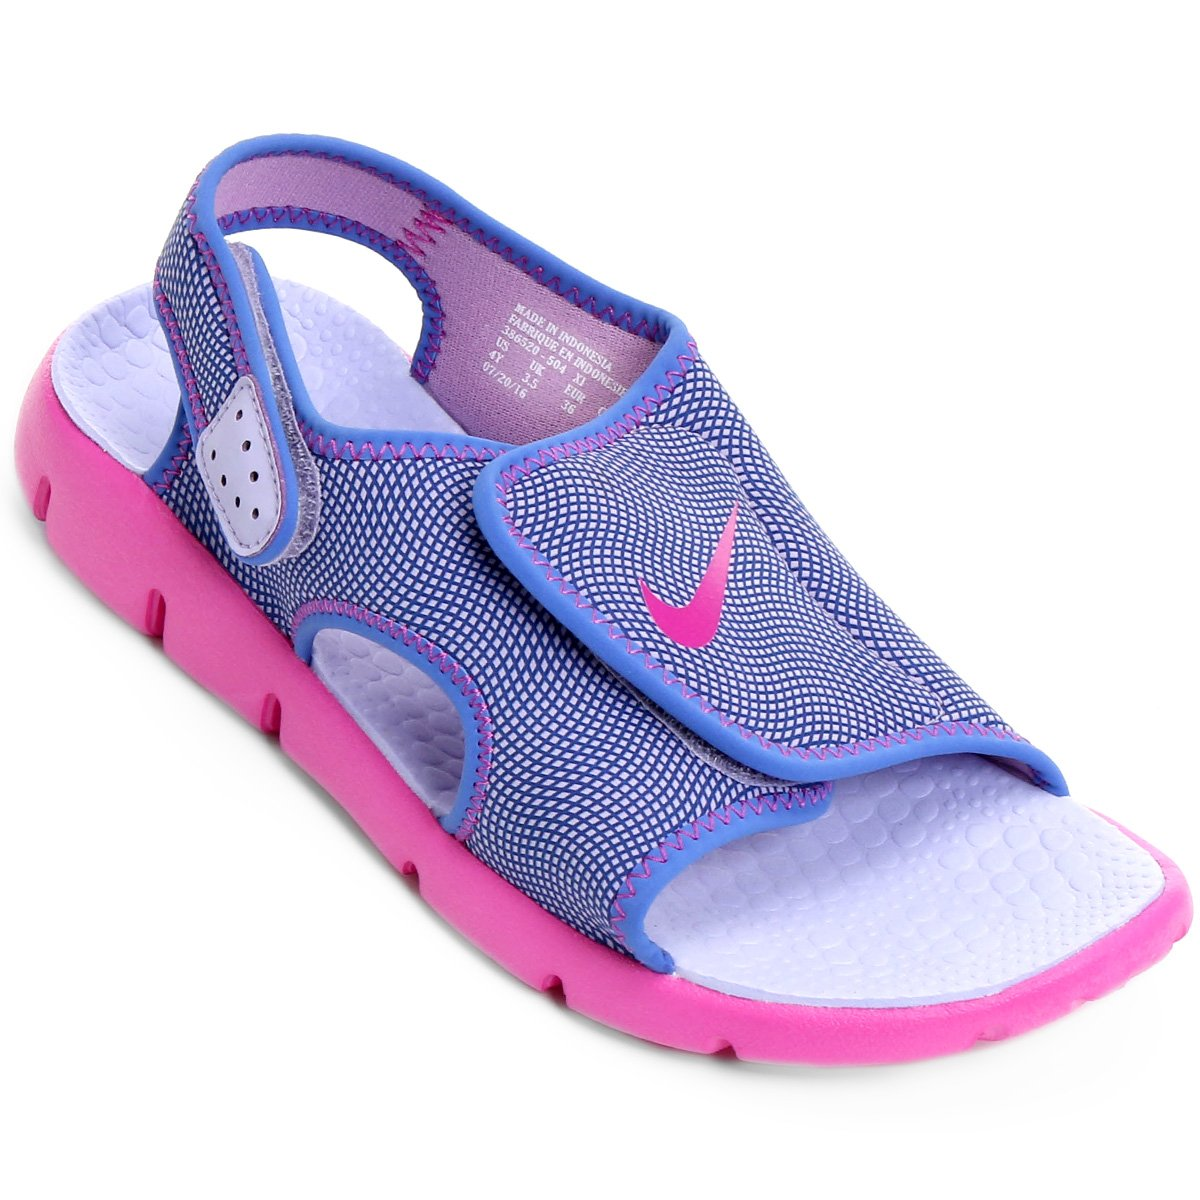 Adjust Feminina Infantil Pink E Sandália 4 Ggp Sunray Nike Azul 4jLR3A5q